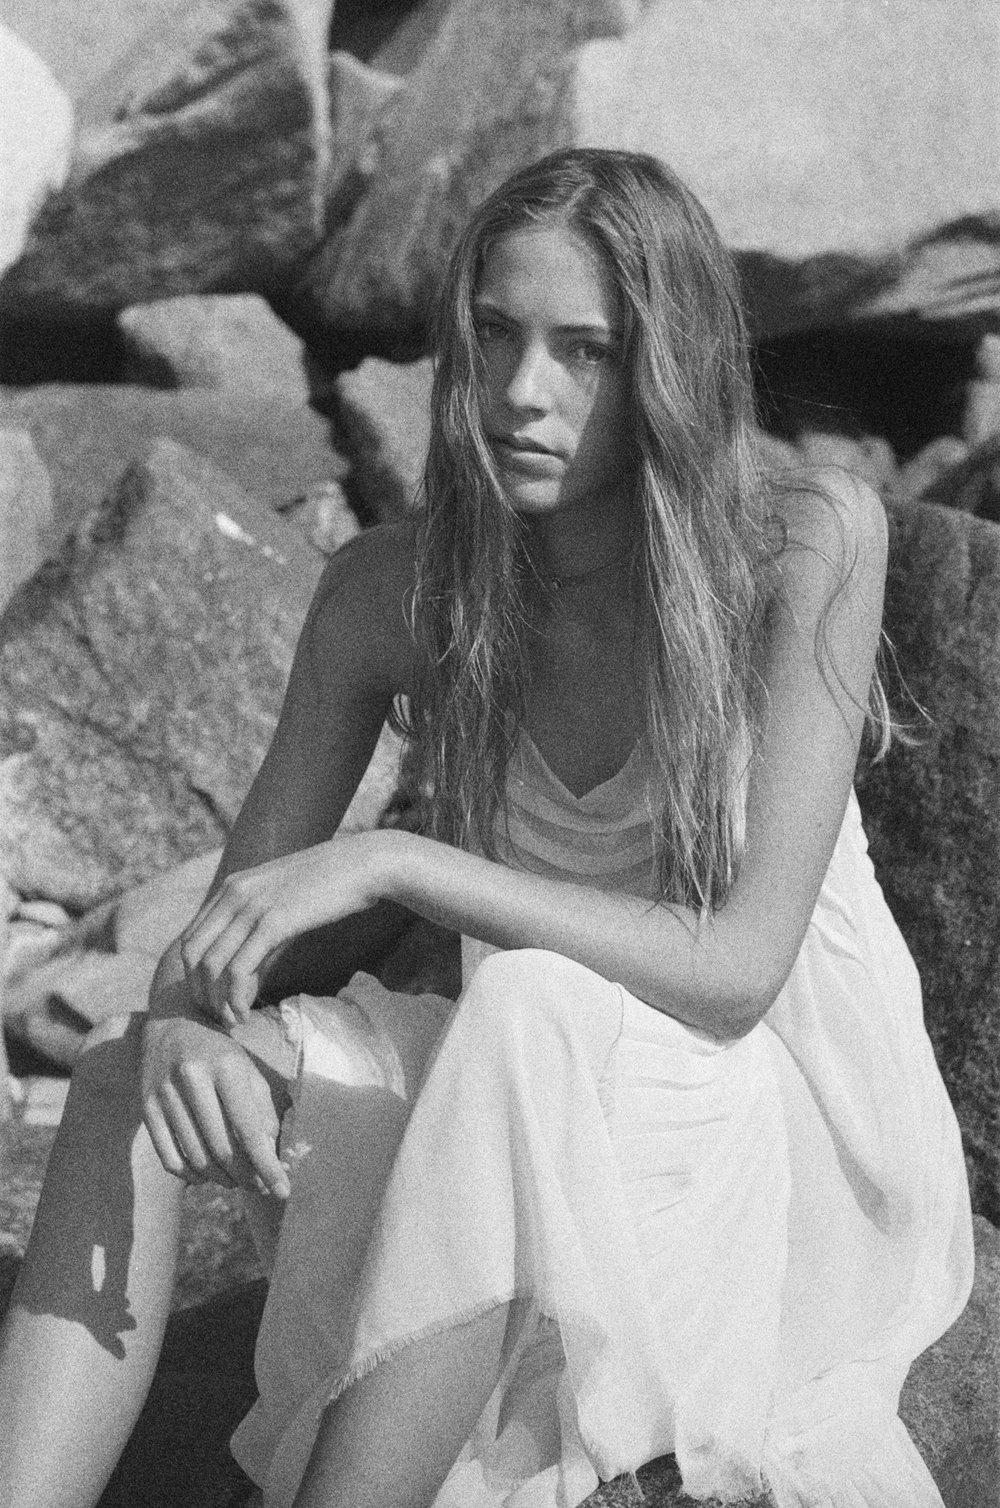 Aliya-Ware-by-Jacqueline-Puwalski-8.jpg